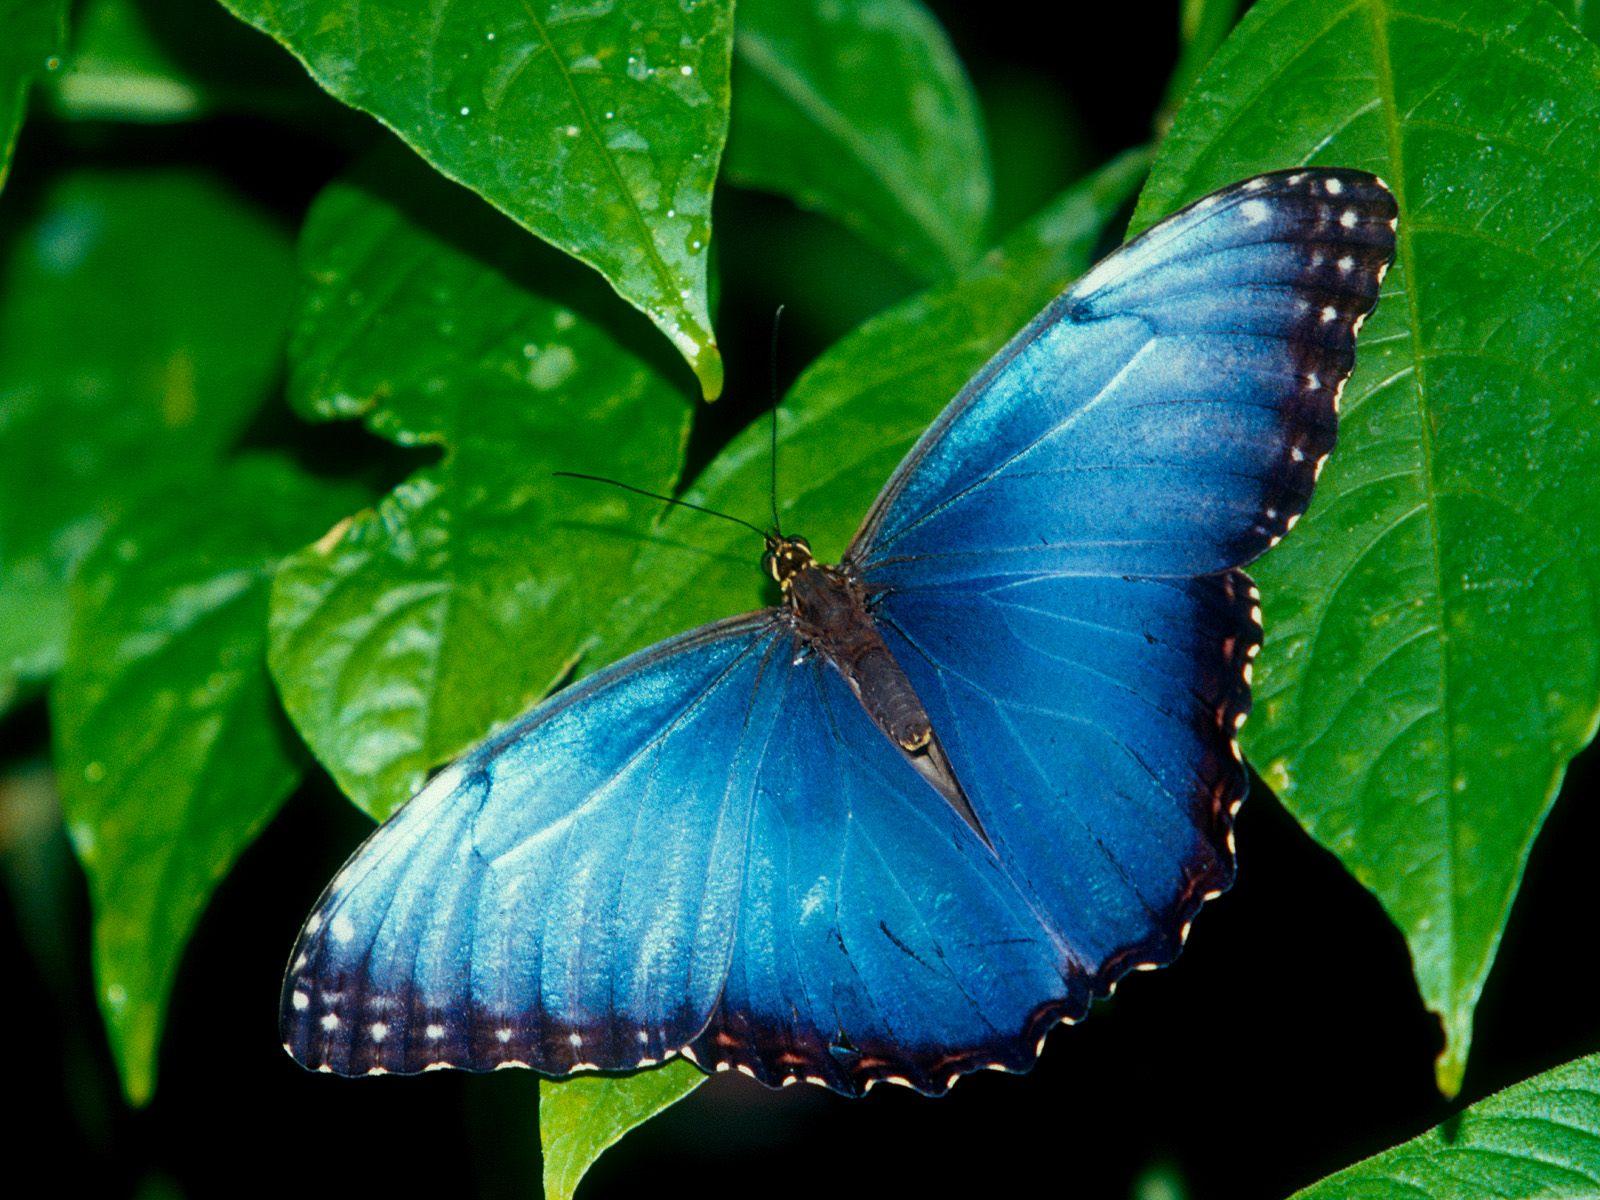 Gallery For gt 3d Butterfly Wallpaper Desktop 1600x1200